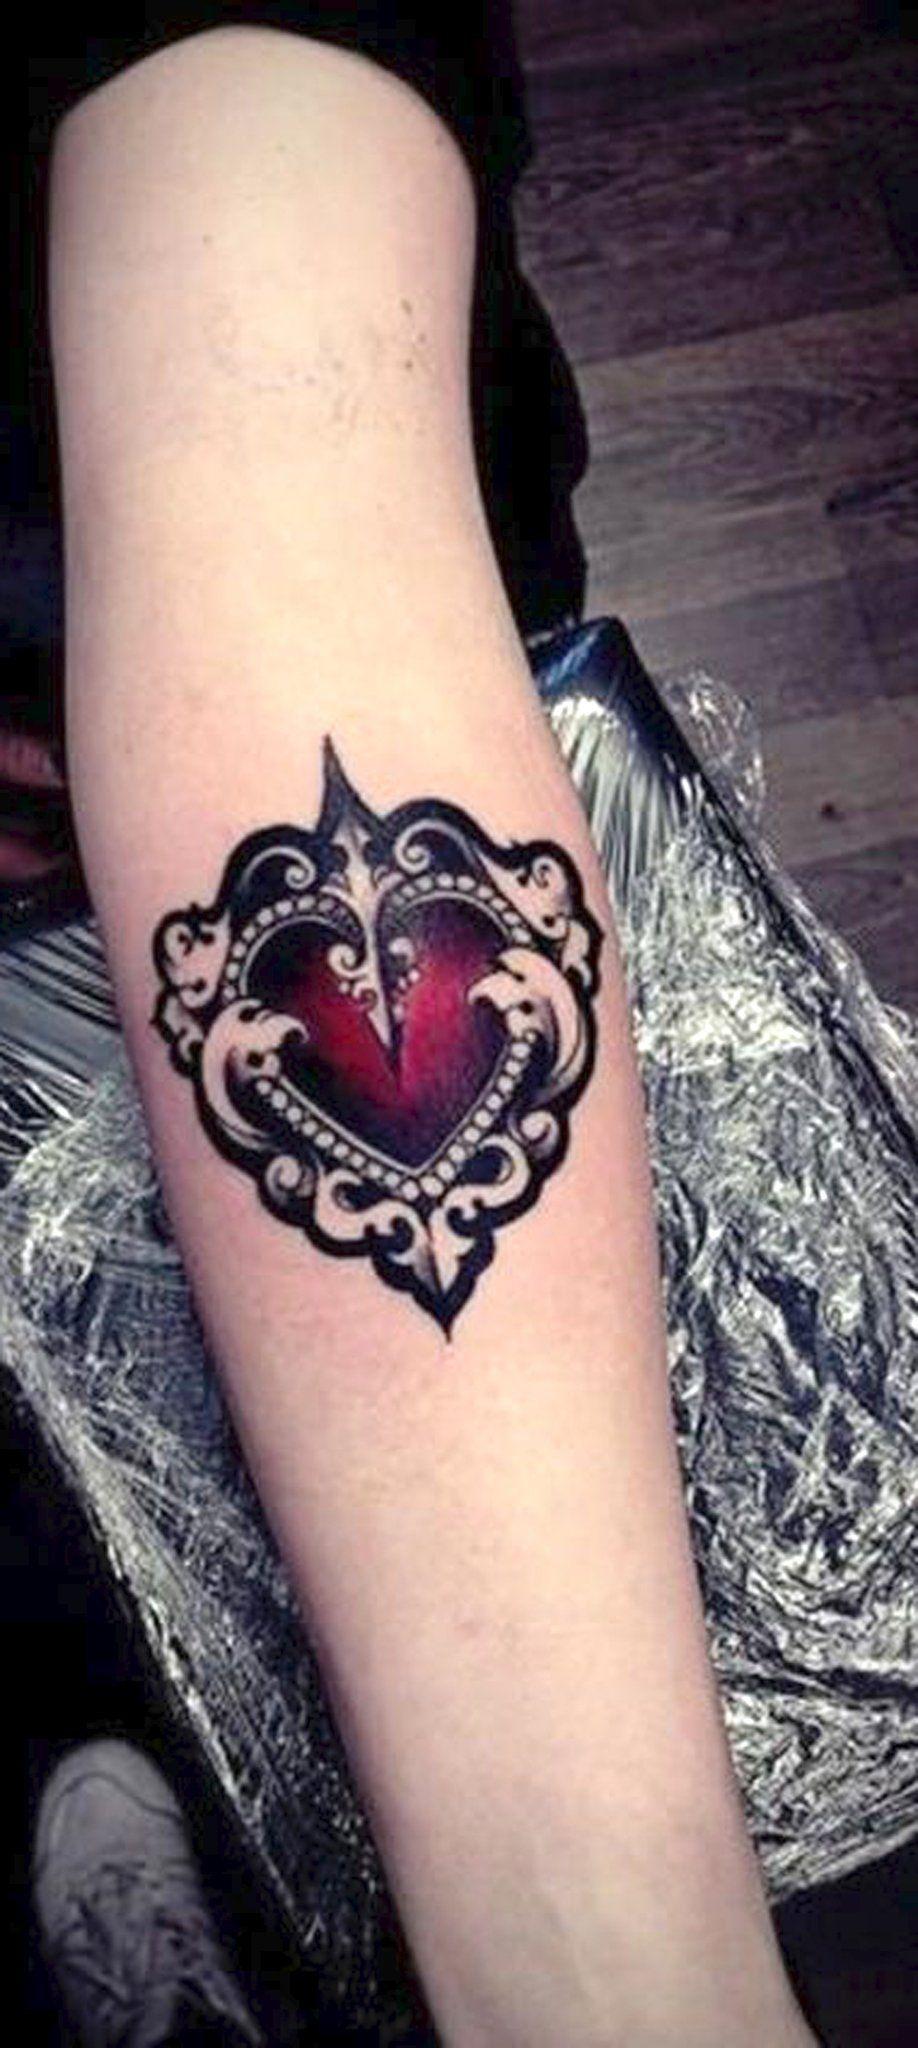 Vintage Victorian Red Heart Forearm Tattoo Ideas ideas